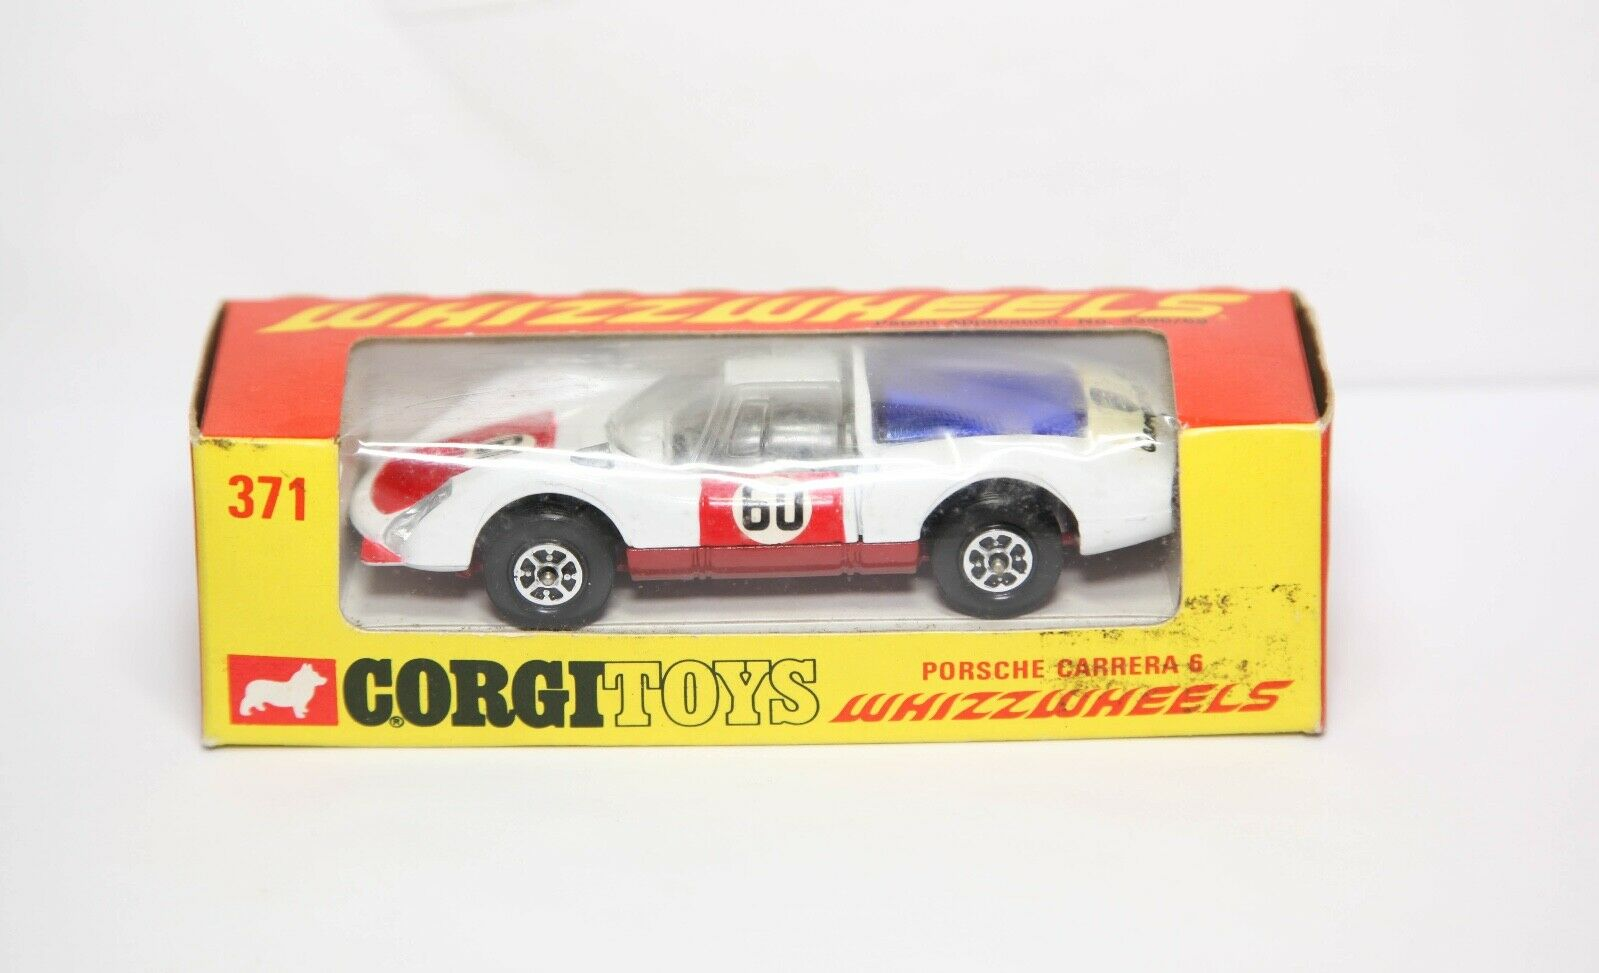 CORGI 371 PORSCHE CARRERA 6 WHIZZWHEELS dans sa boîte d'origine-Near Comme neuf Vintage